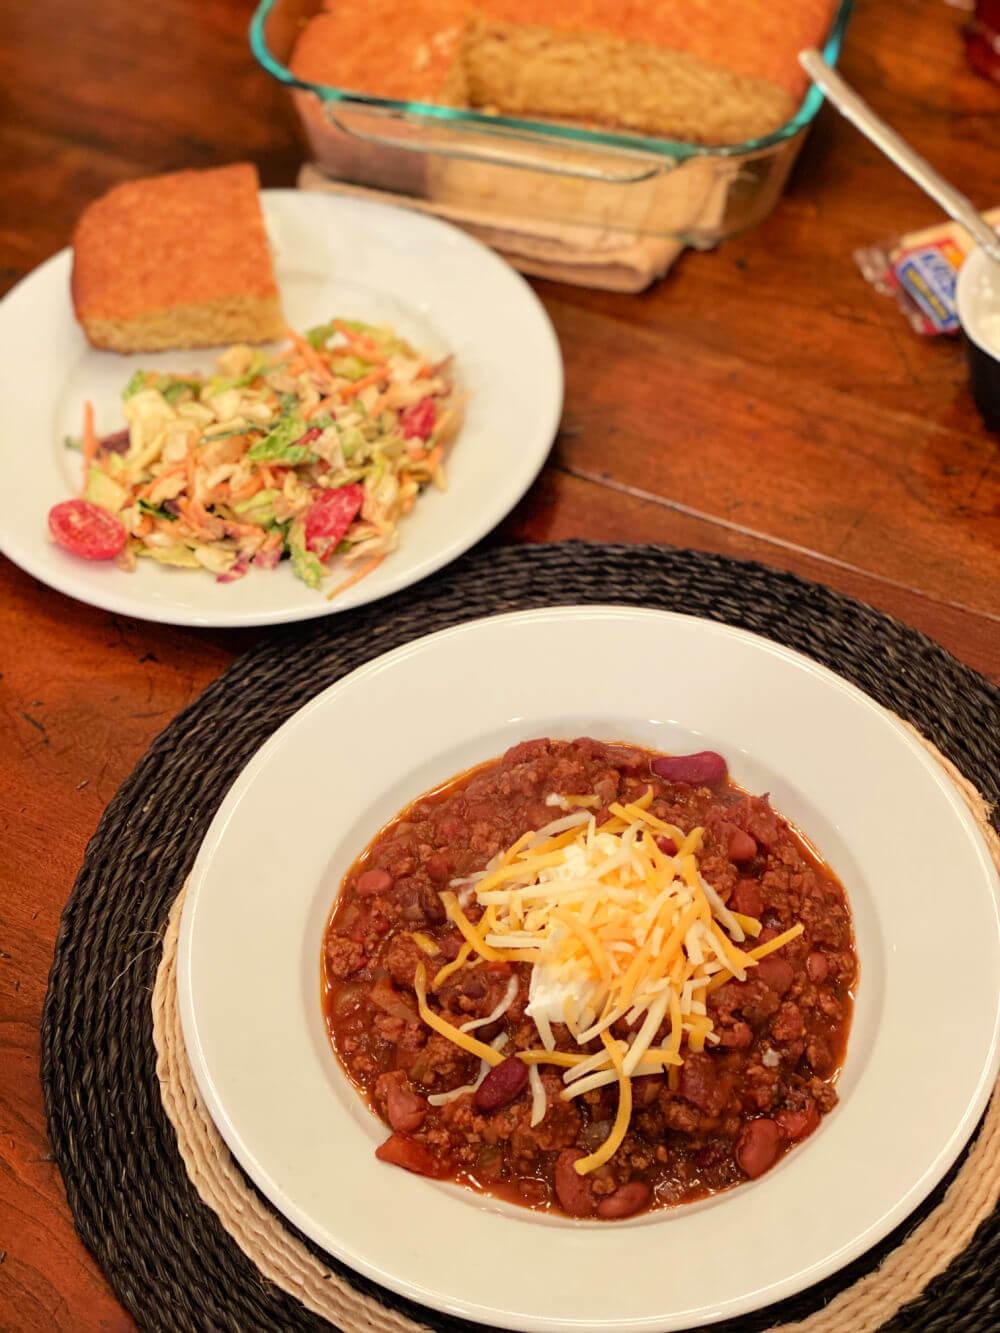 chili, chopped salad and cornbread